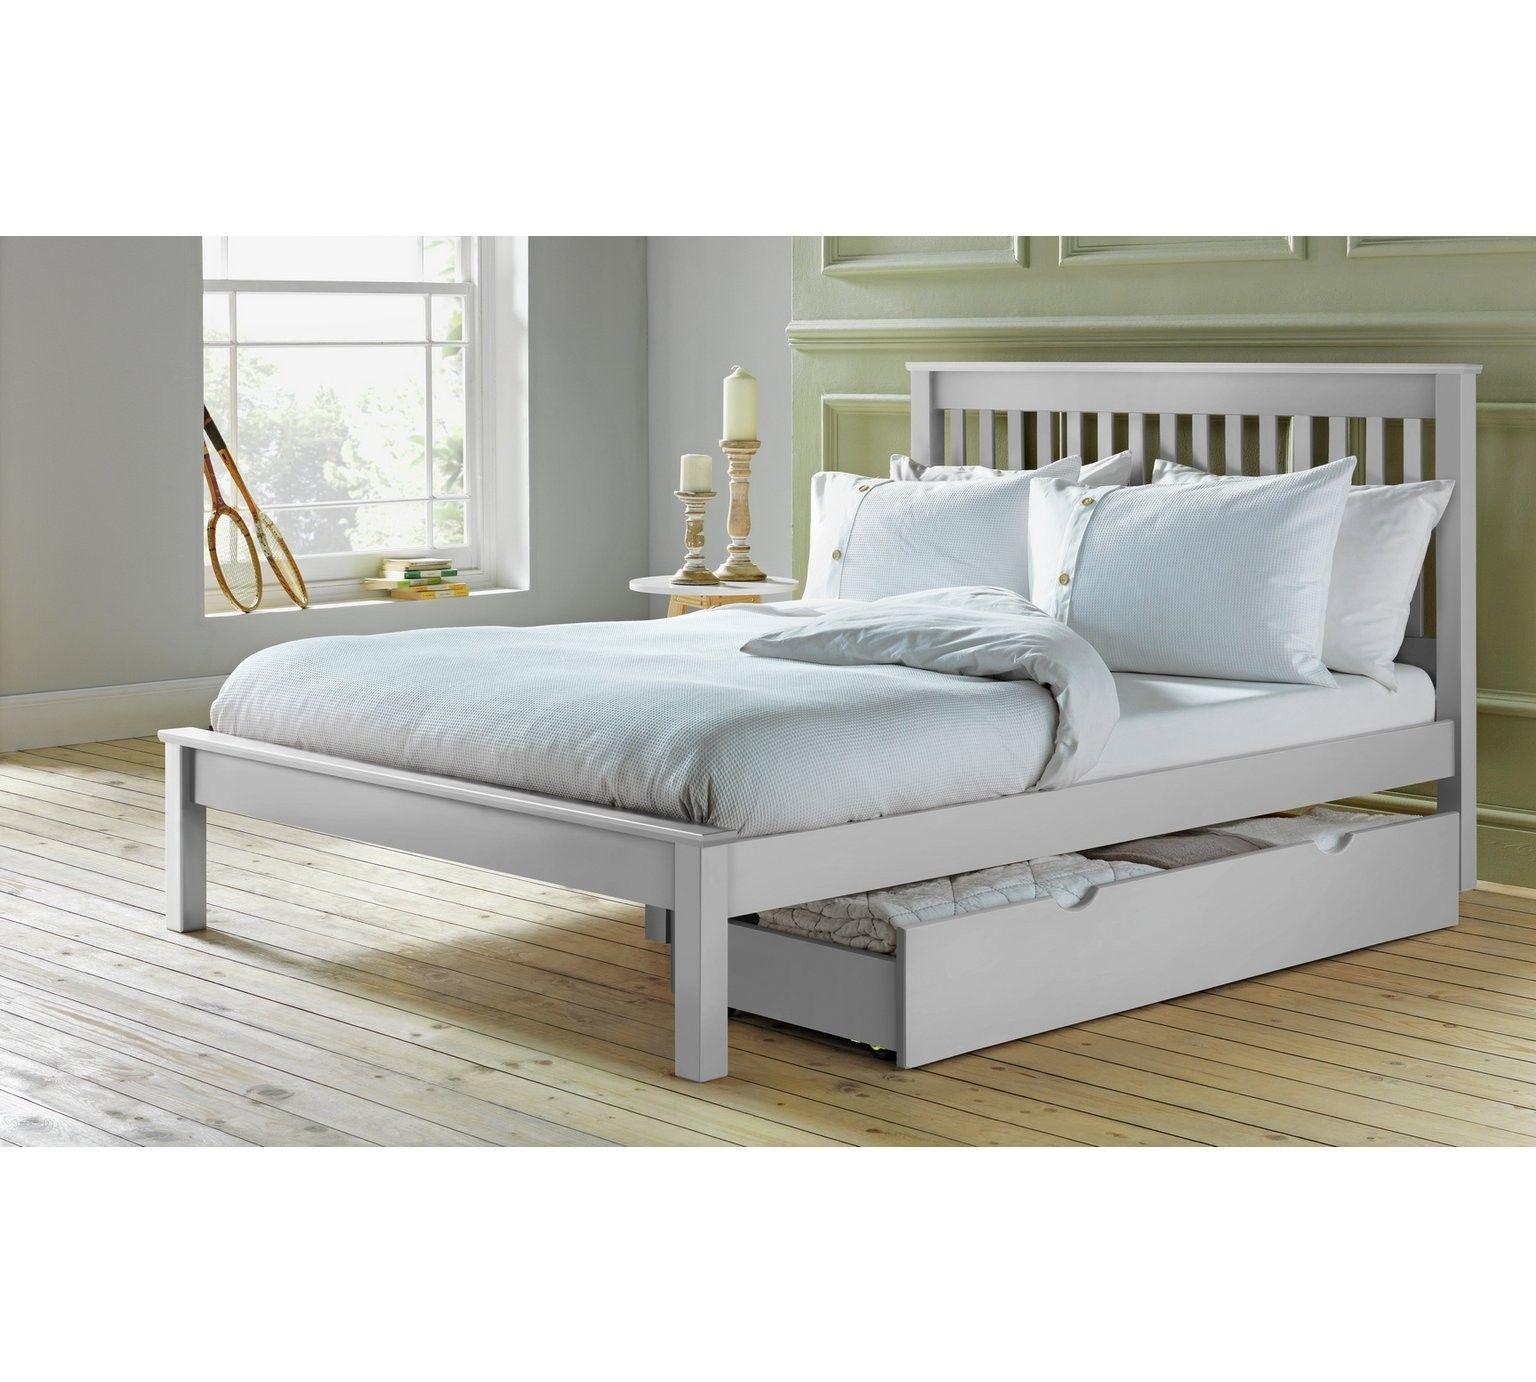 Argos Collection Aspley Double Bed Frame White White Bed Frame Double Bed Frame Bed Frame